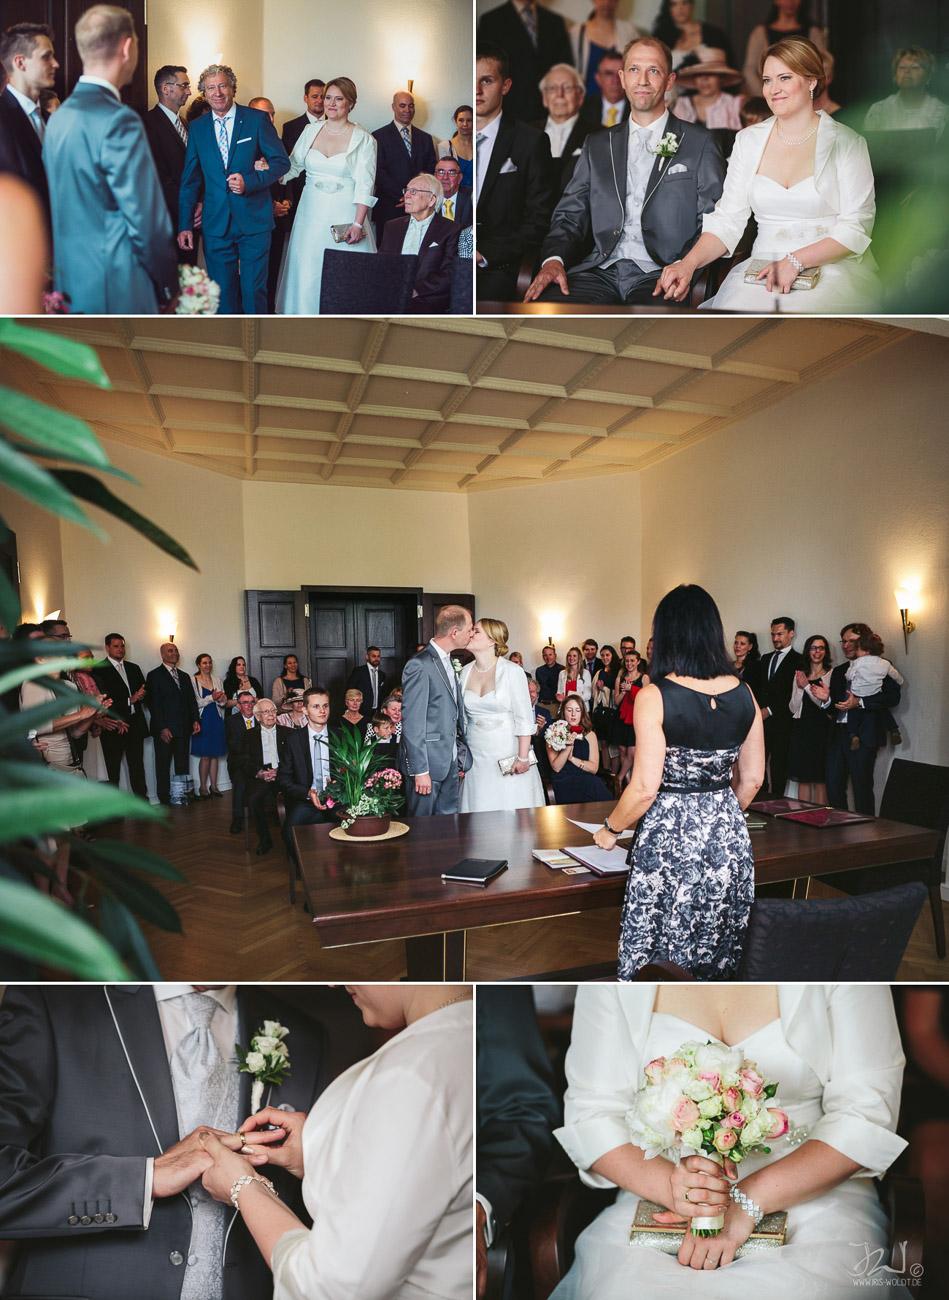 0021_Hochzeitsfotograf_Potsdam_Gut_Schloss_Golm_IrisWoldt22